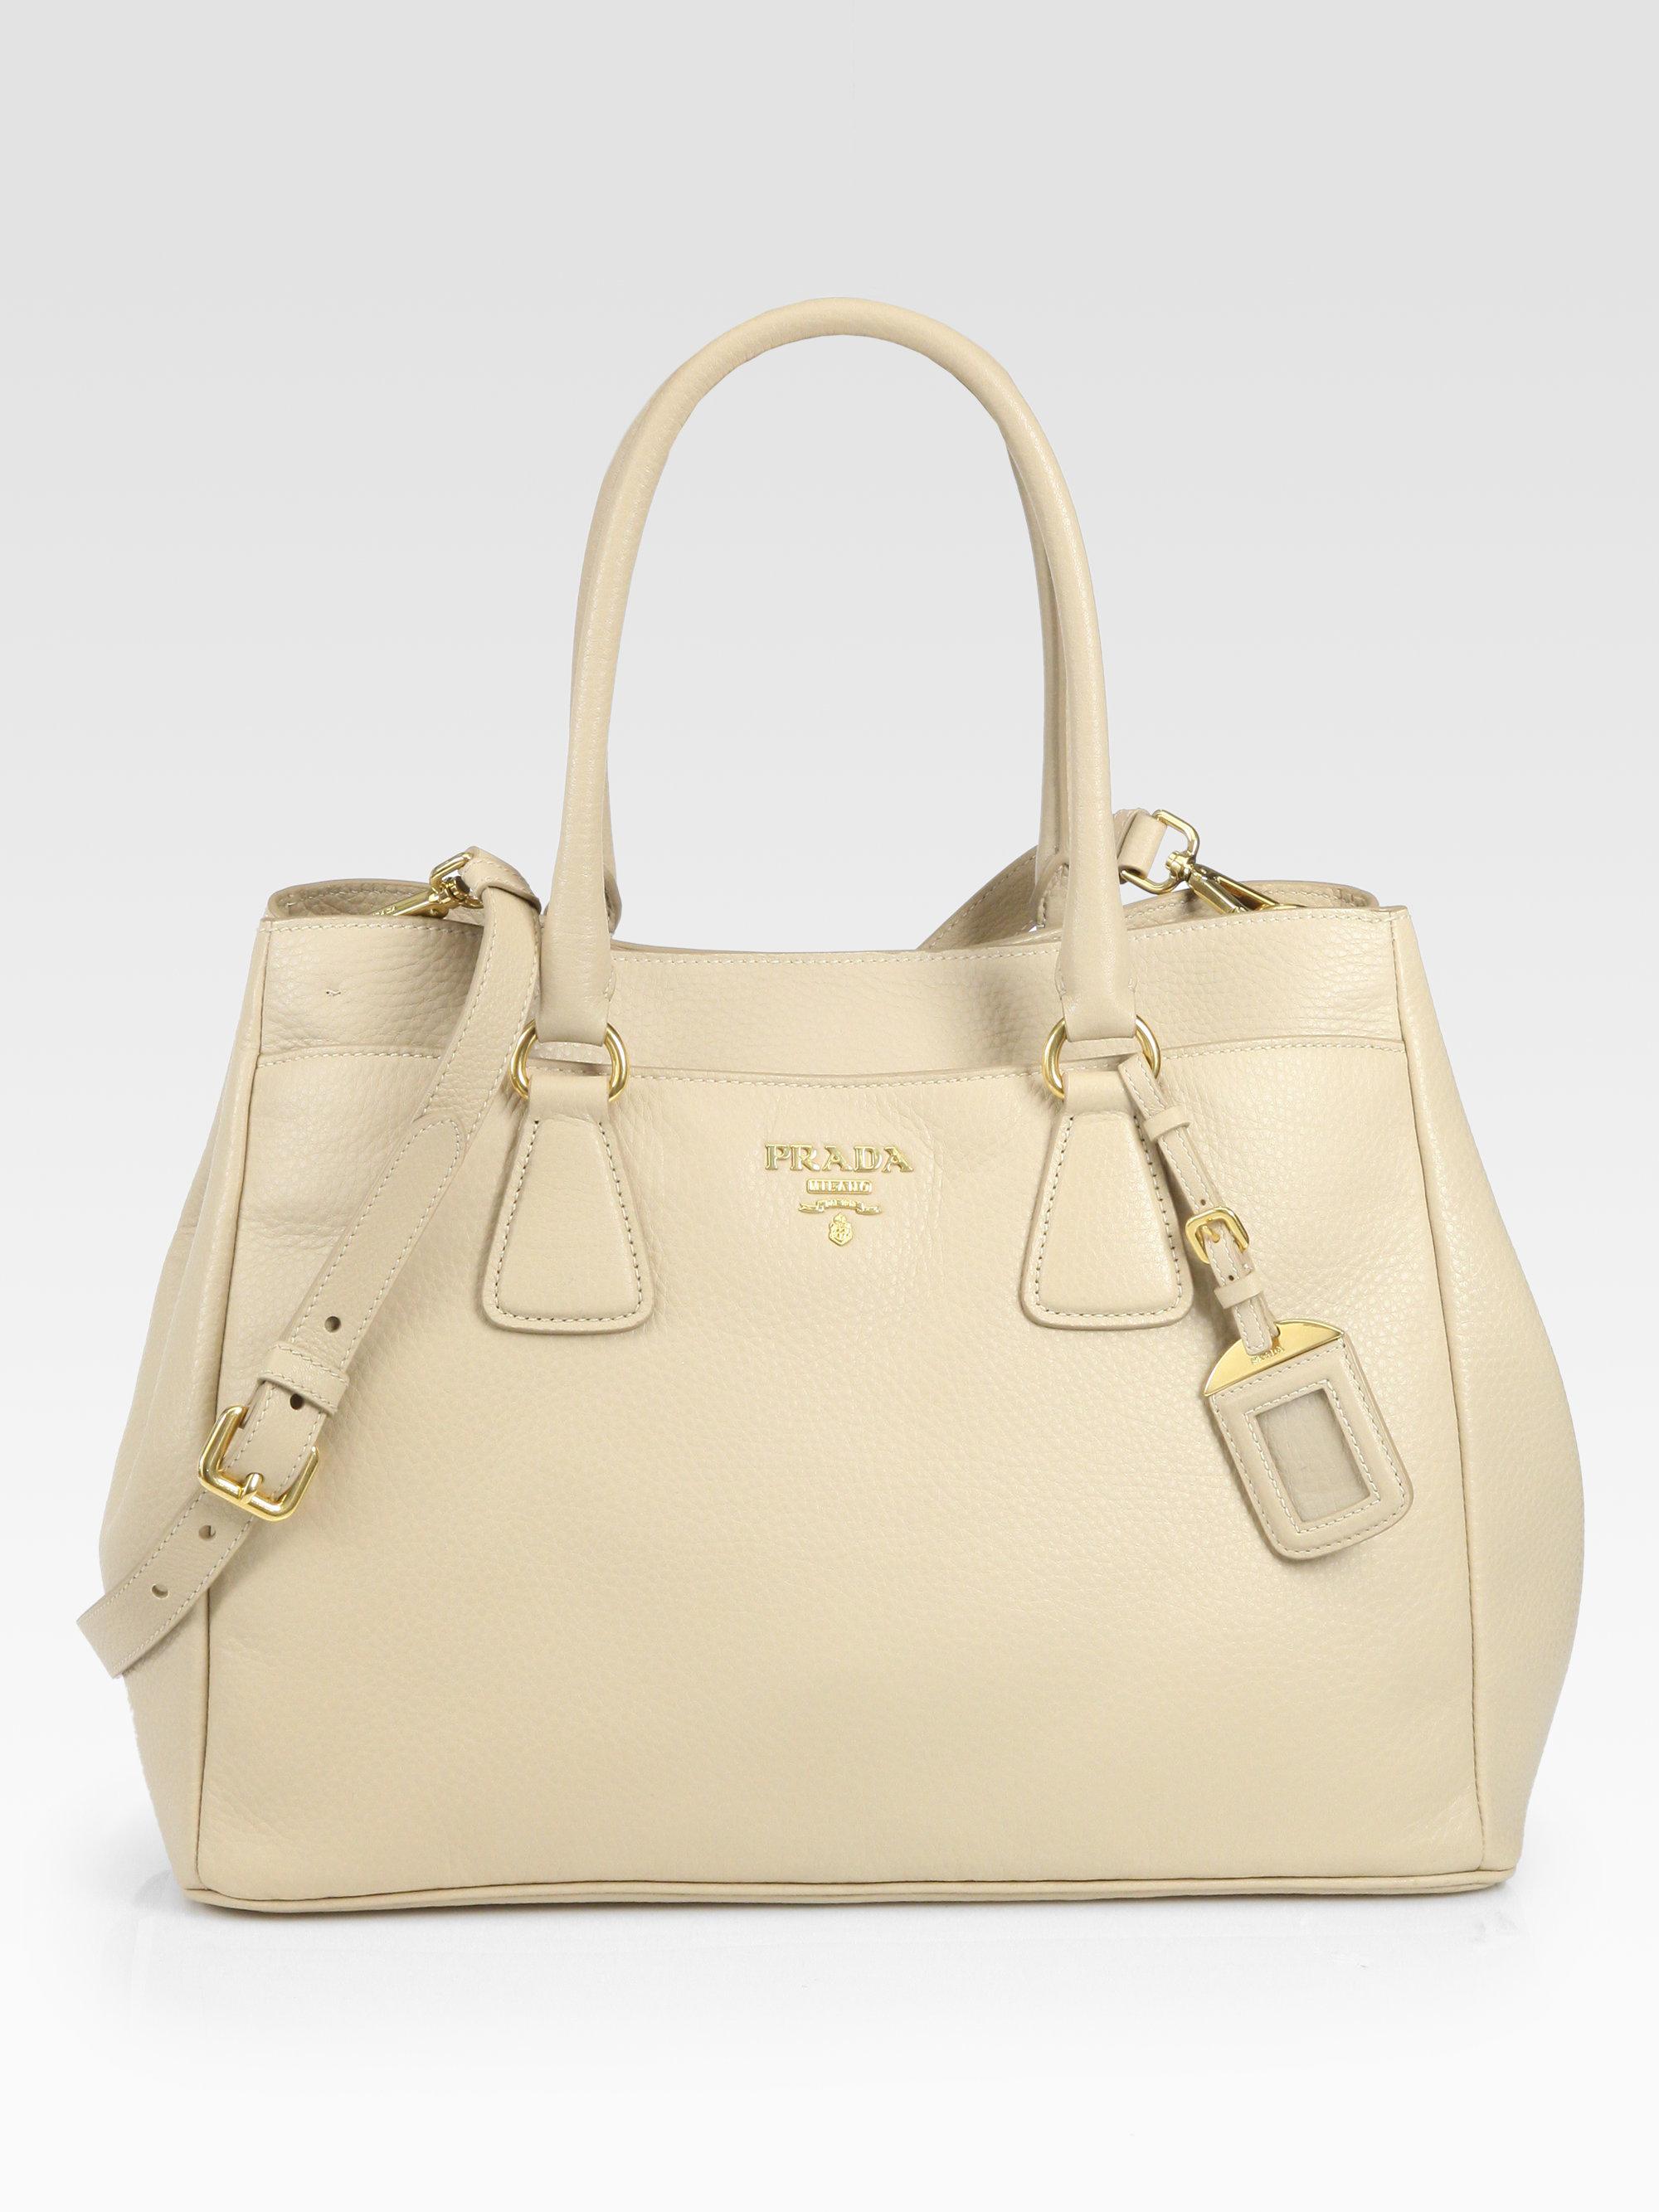 www prada handbag com - Prada Daino East West Tote in Beige (sabbia-sand) | Lyst